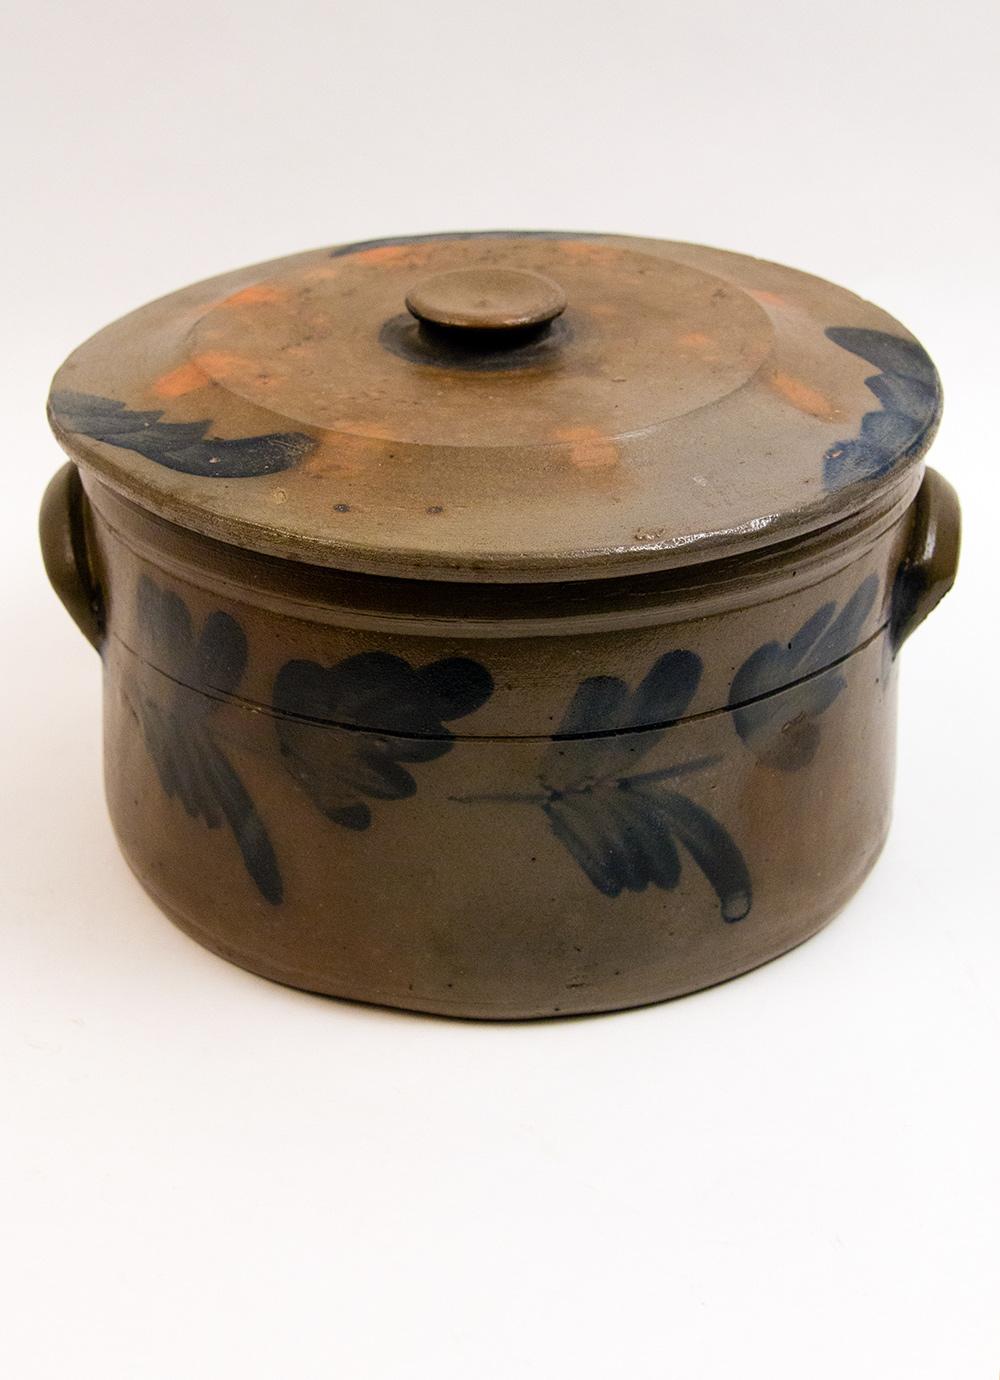 One Gallon Lidded Blue Decorated Stoneware Cake Crock Salt